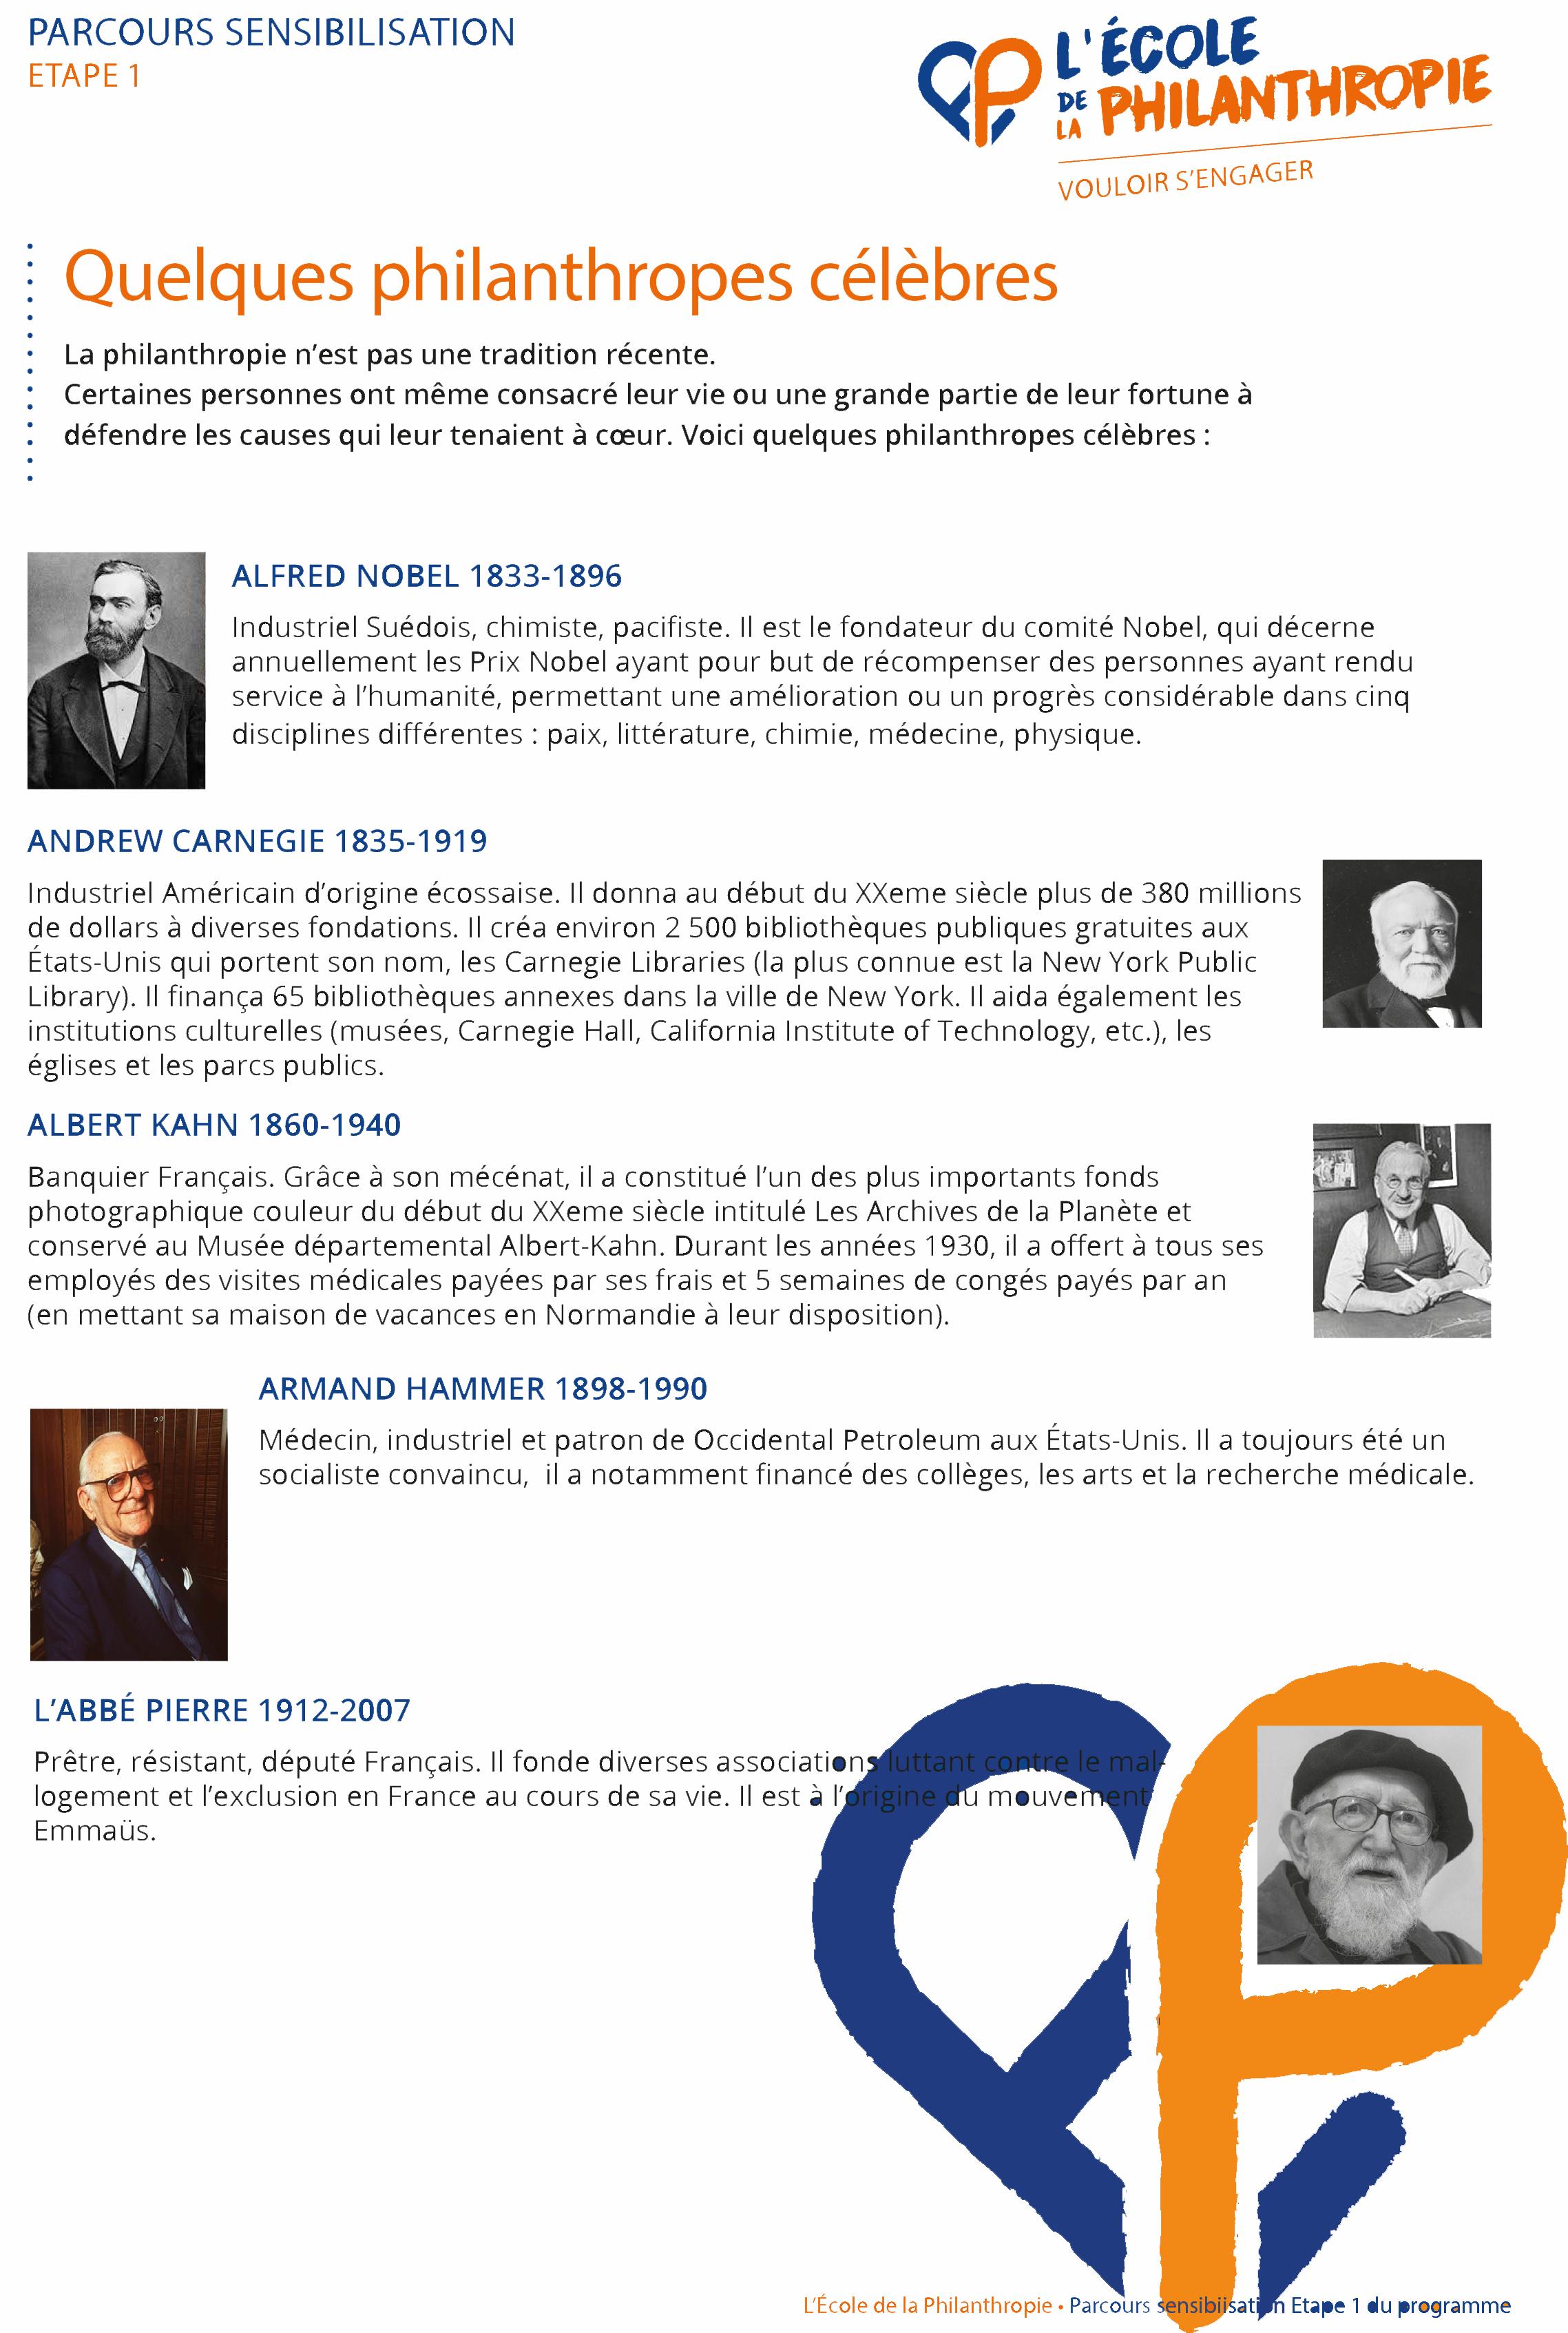 Quelques Philanthropes célèbres